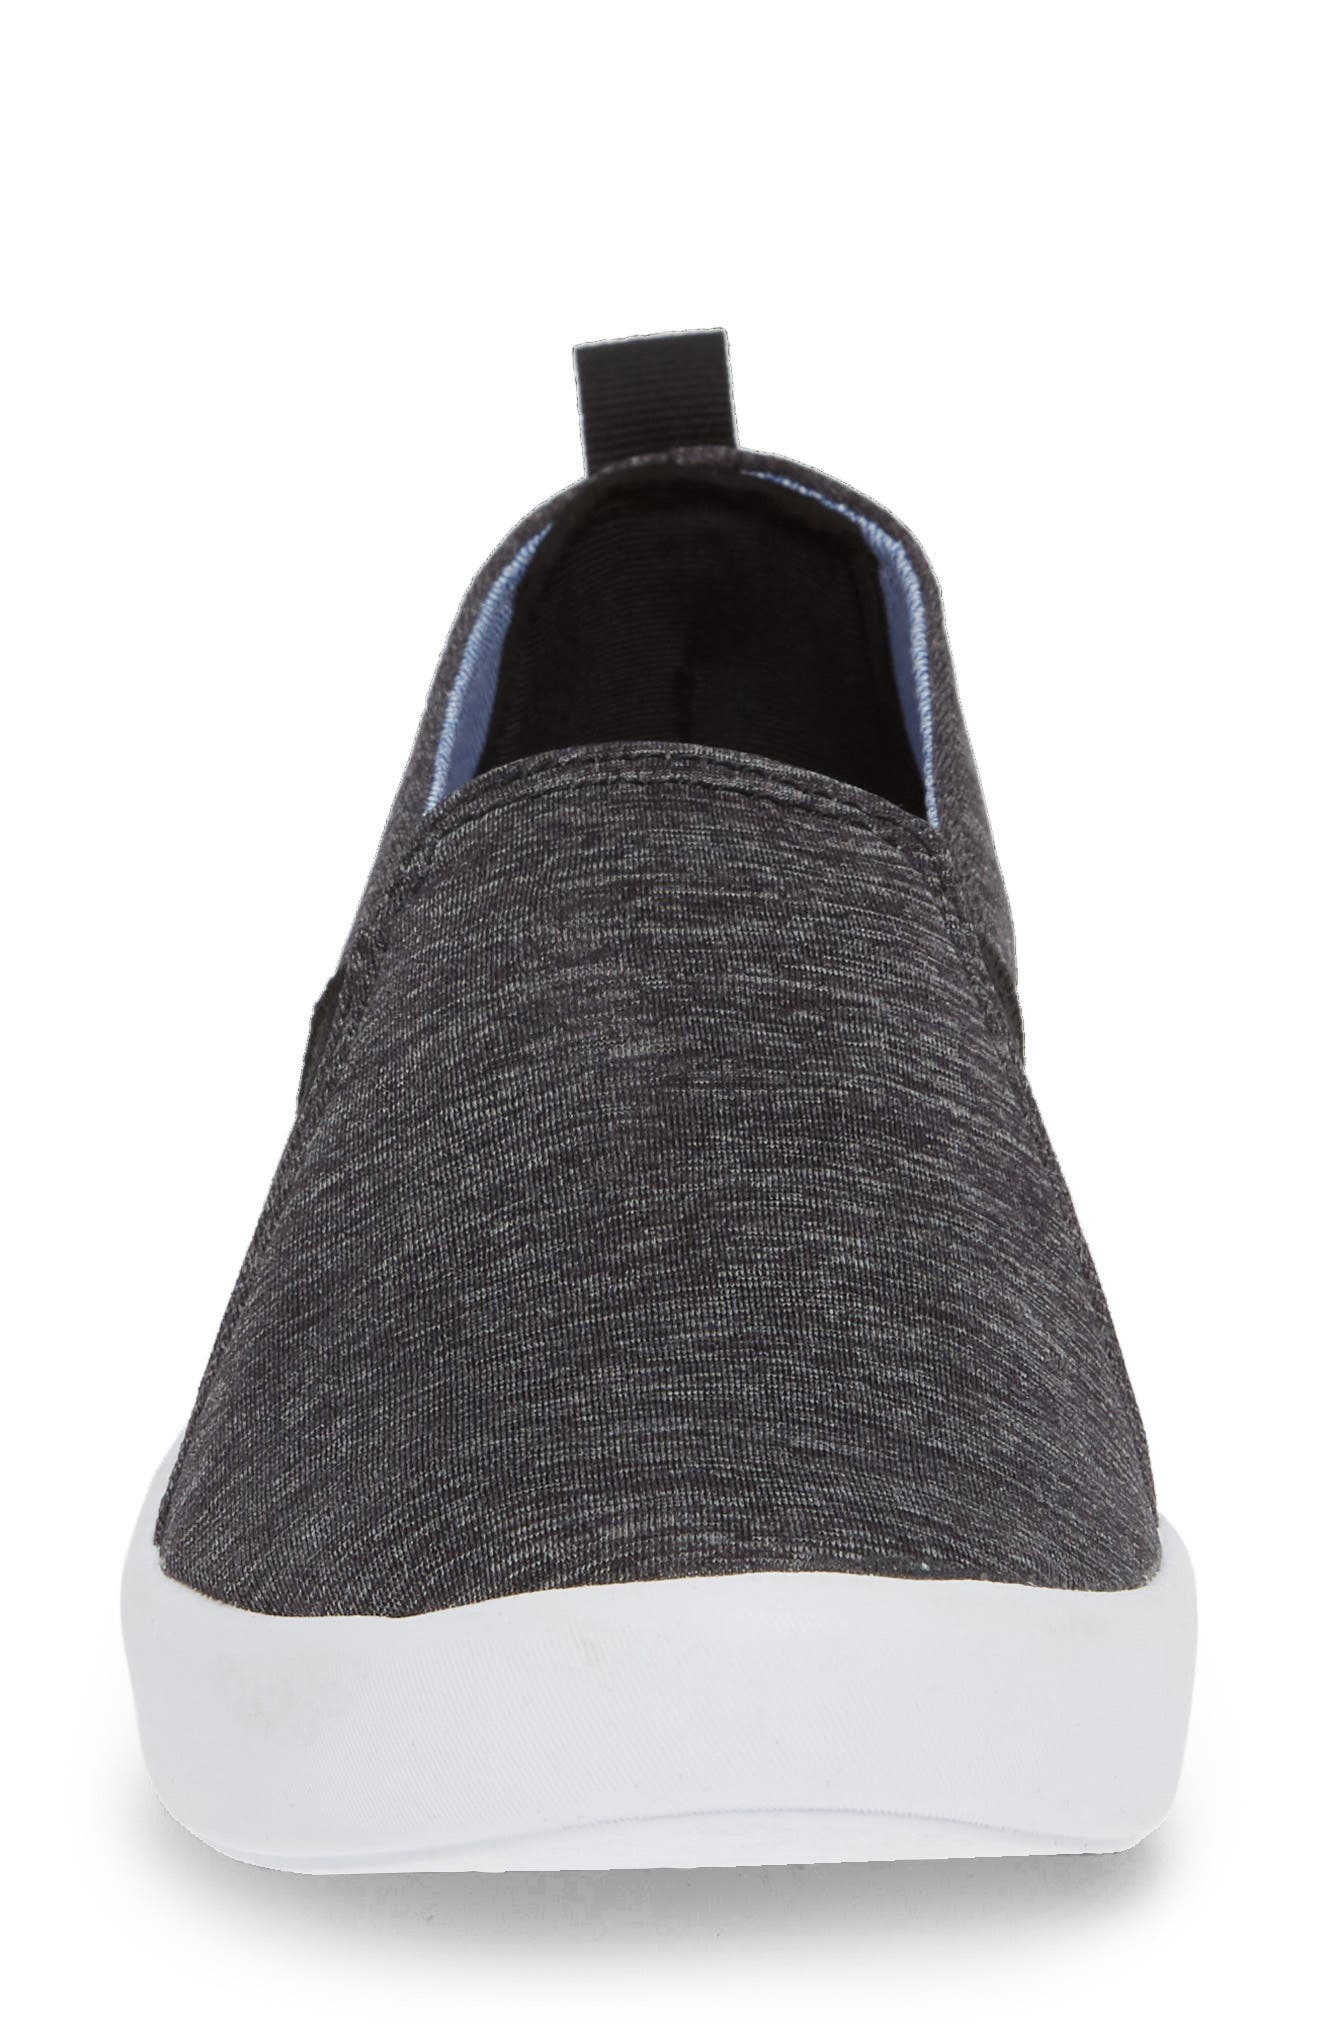 KEDS<SUP>®</SUP>, Studio Liv Active Knit Sneaker, Alternate thumbnail 4, color, BLACK